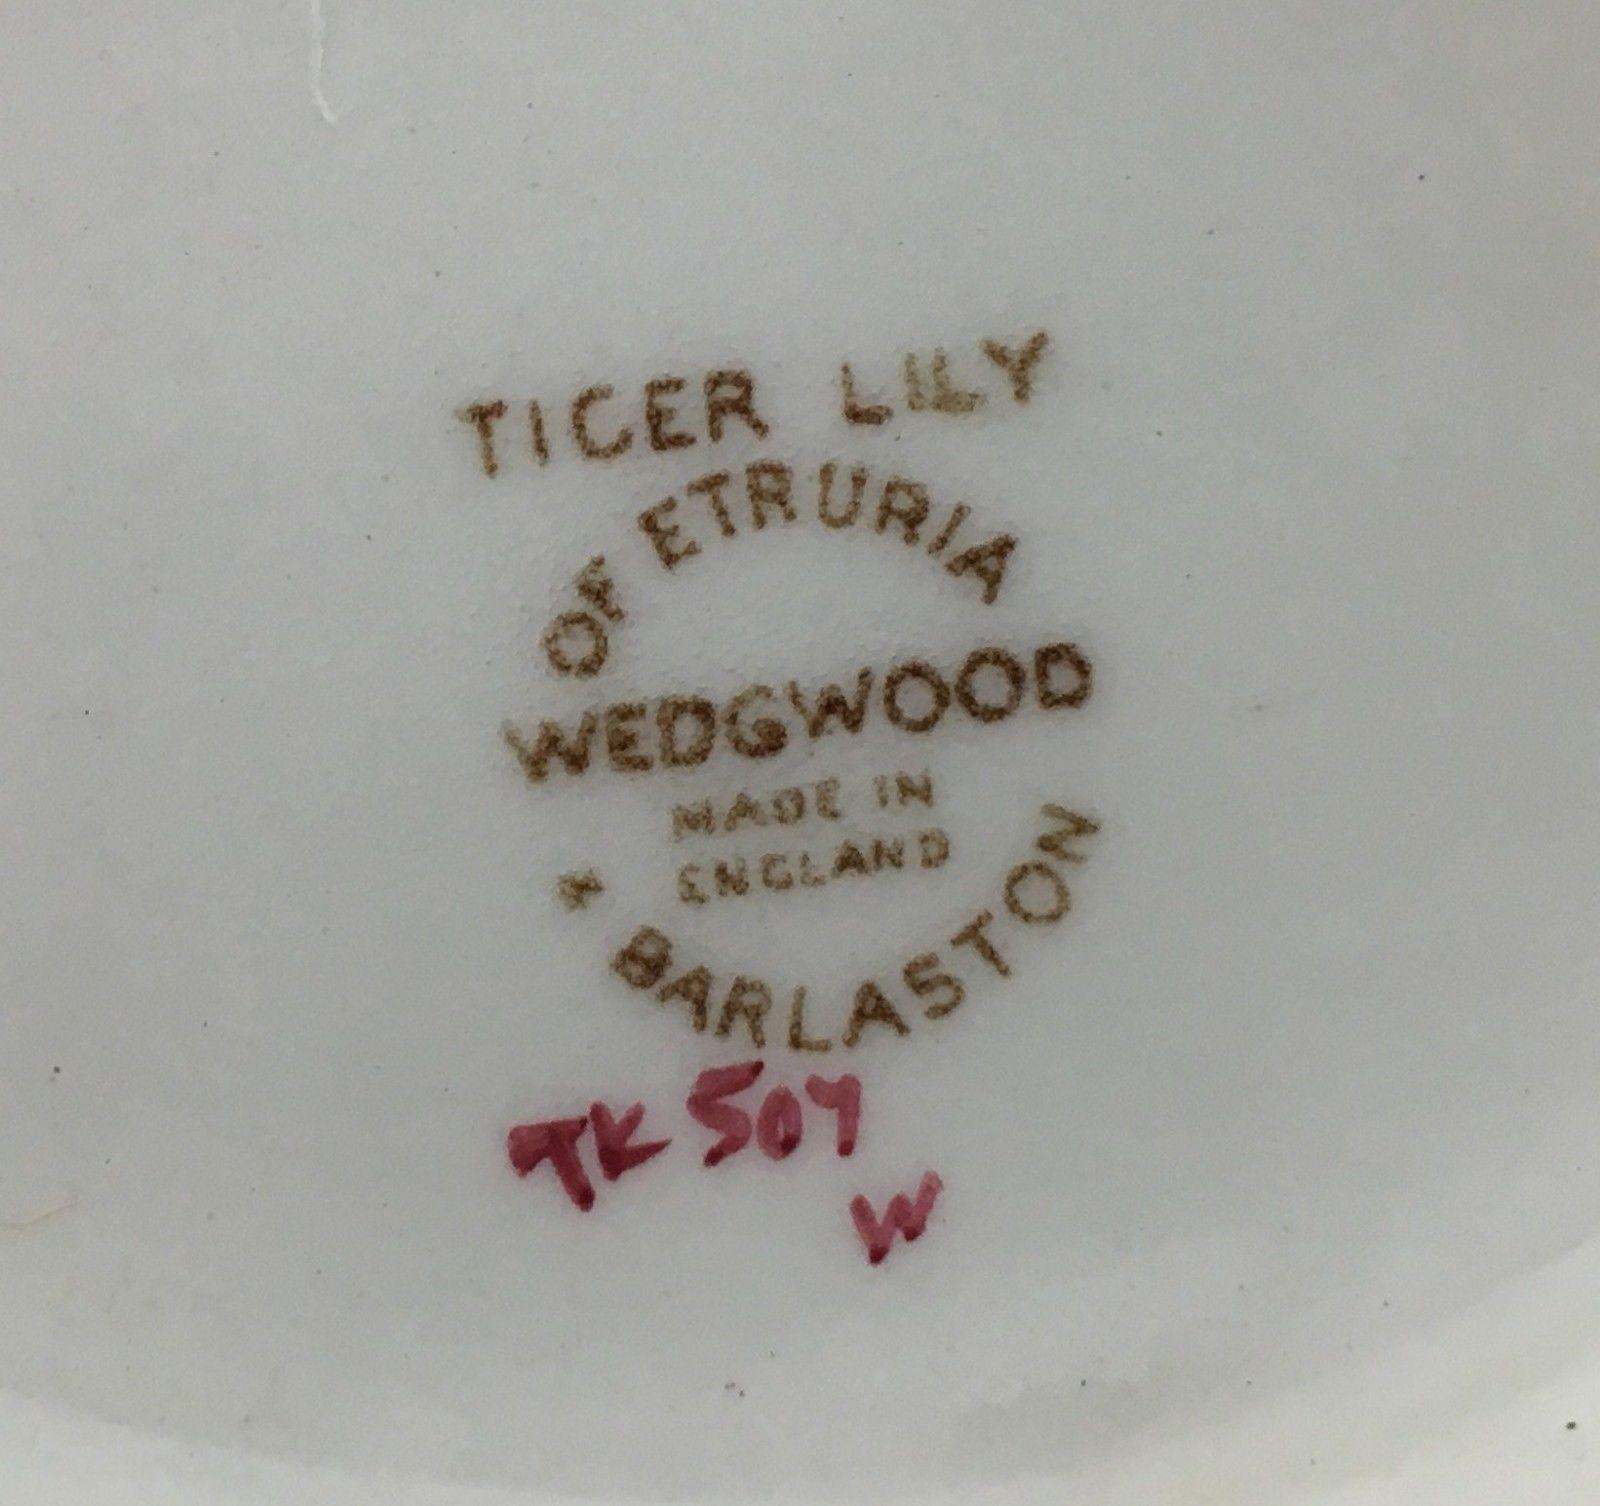 Wedgwood TIGER LILY gravy boat (SKU EC 206) FREE SHIPPING image 4